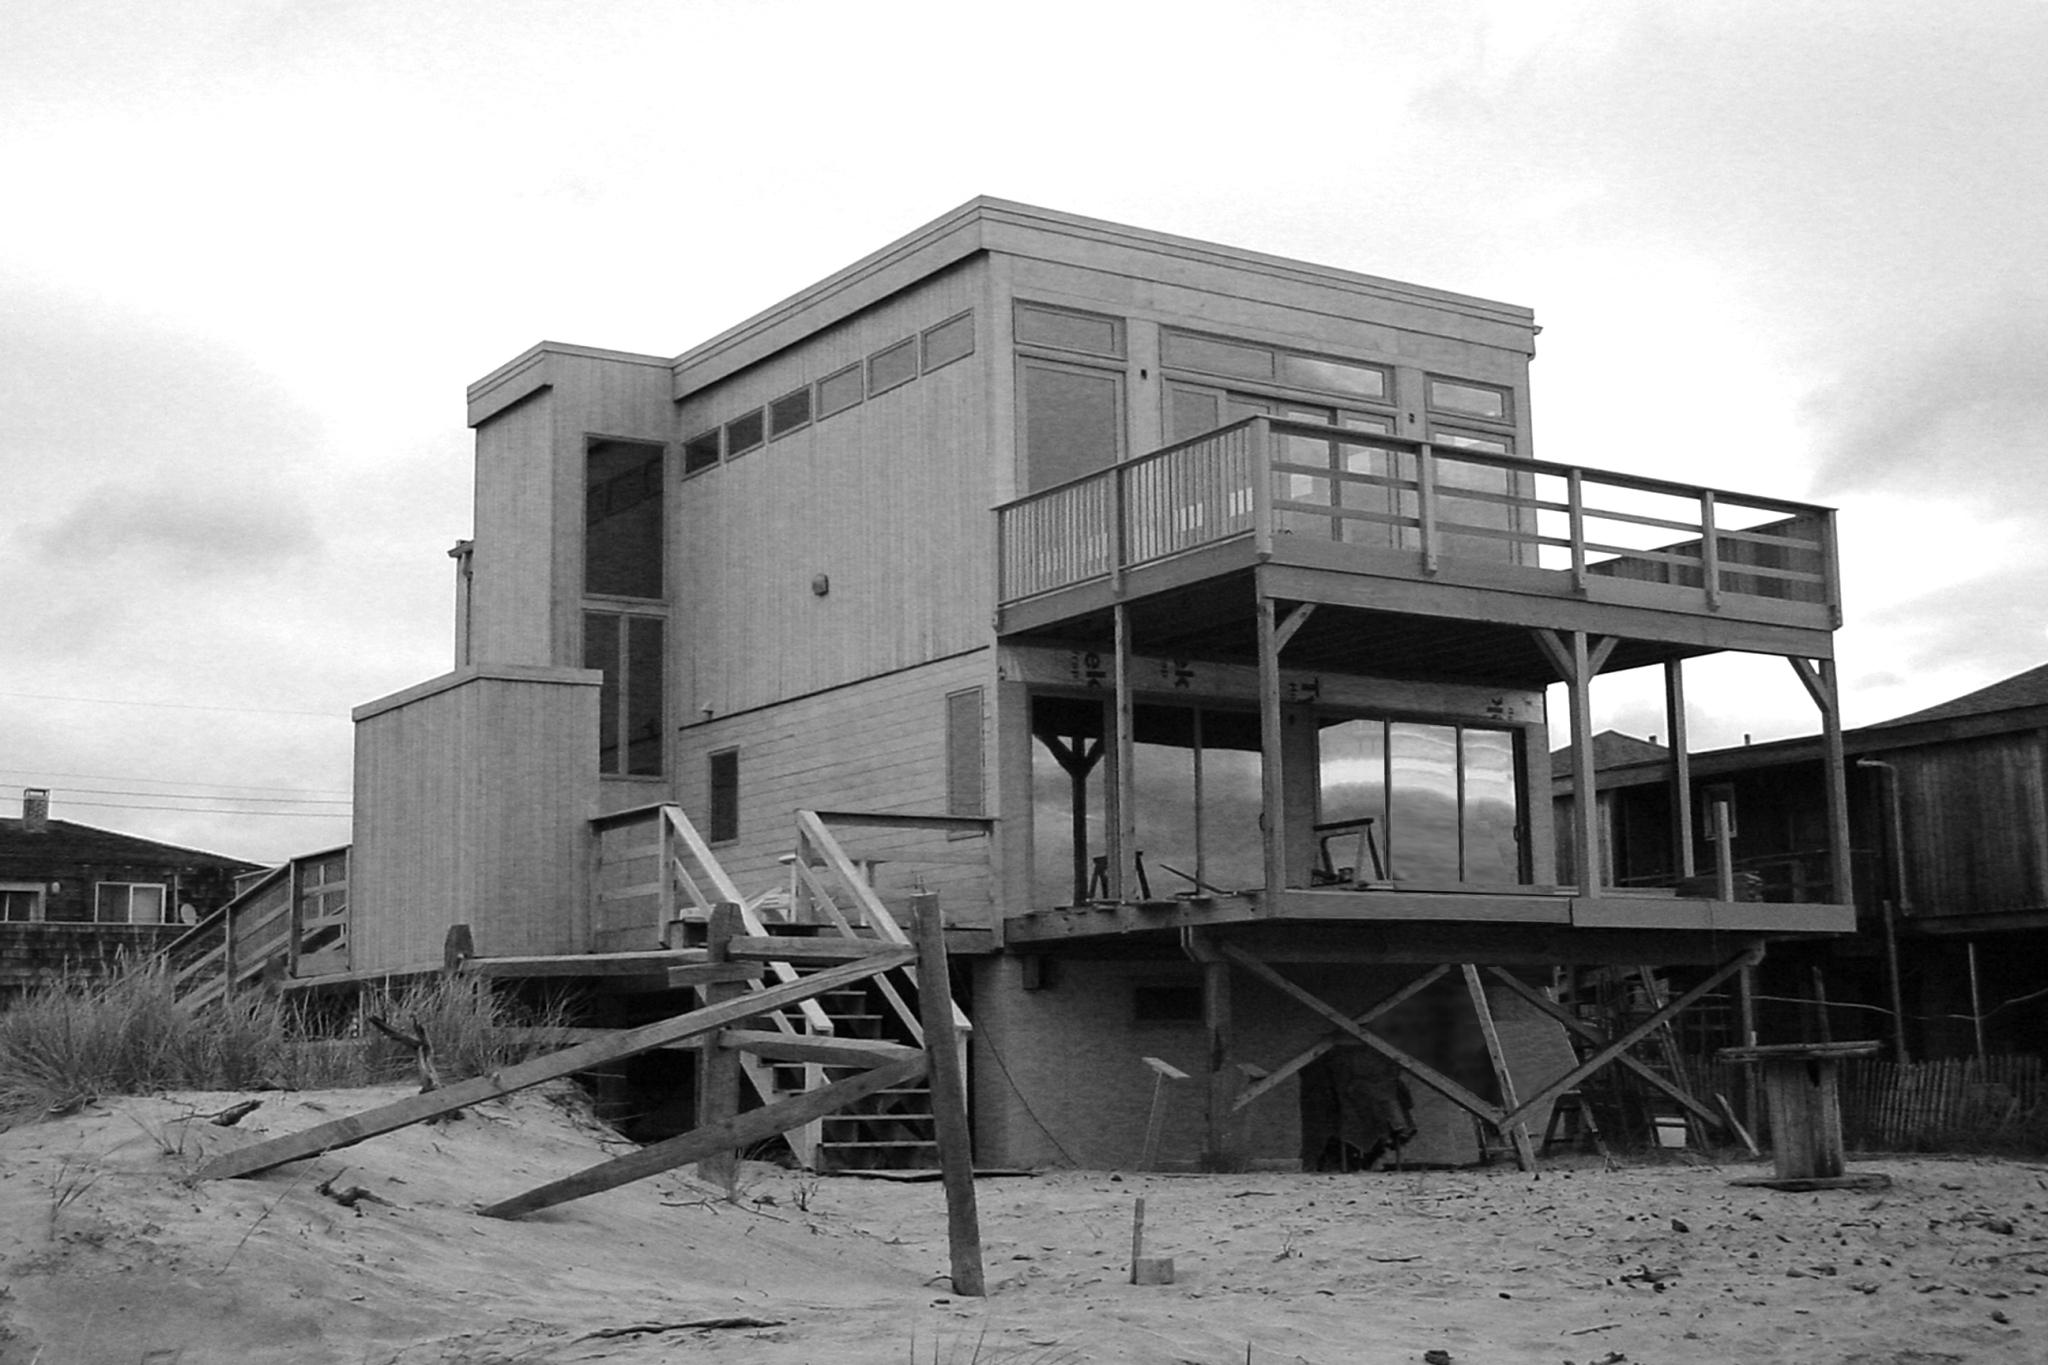 02 - Beach View - no LADDER.jpg